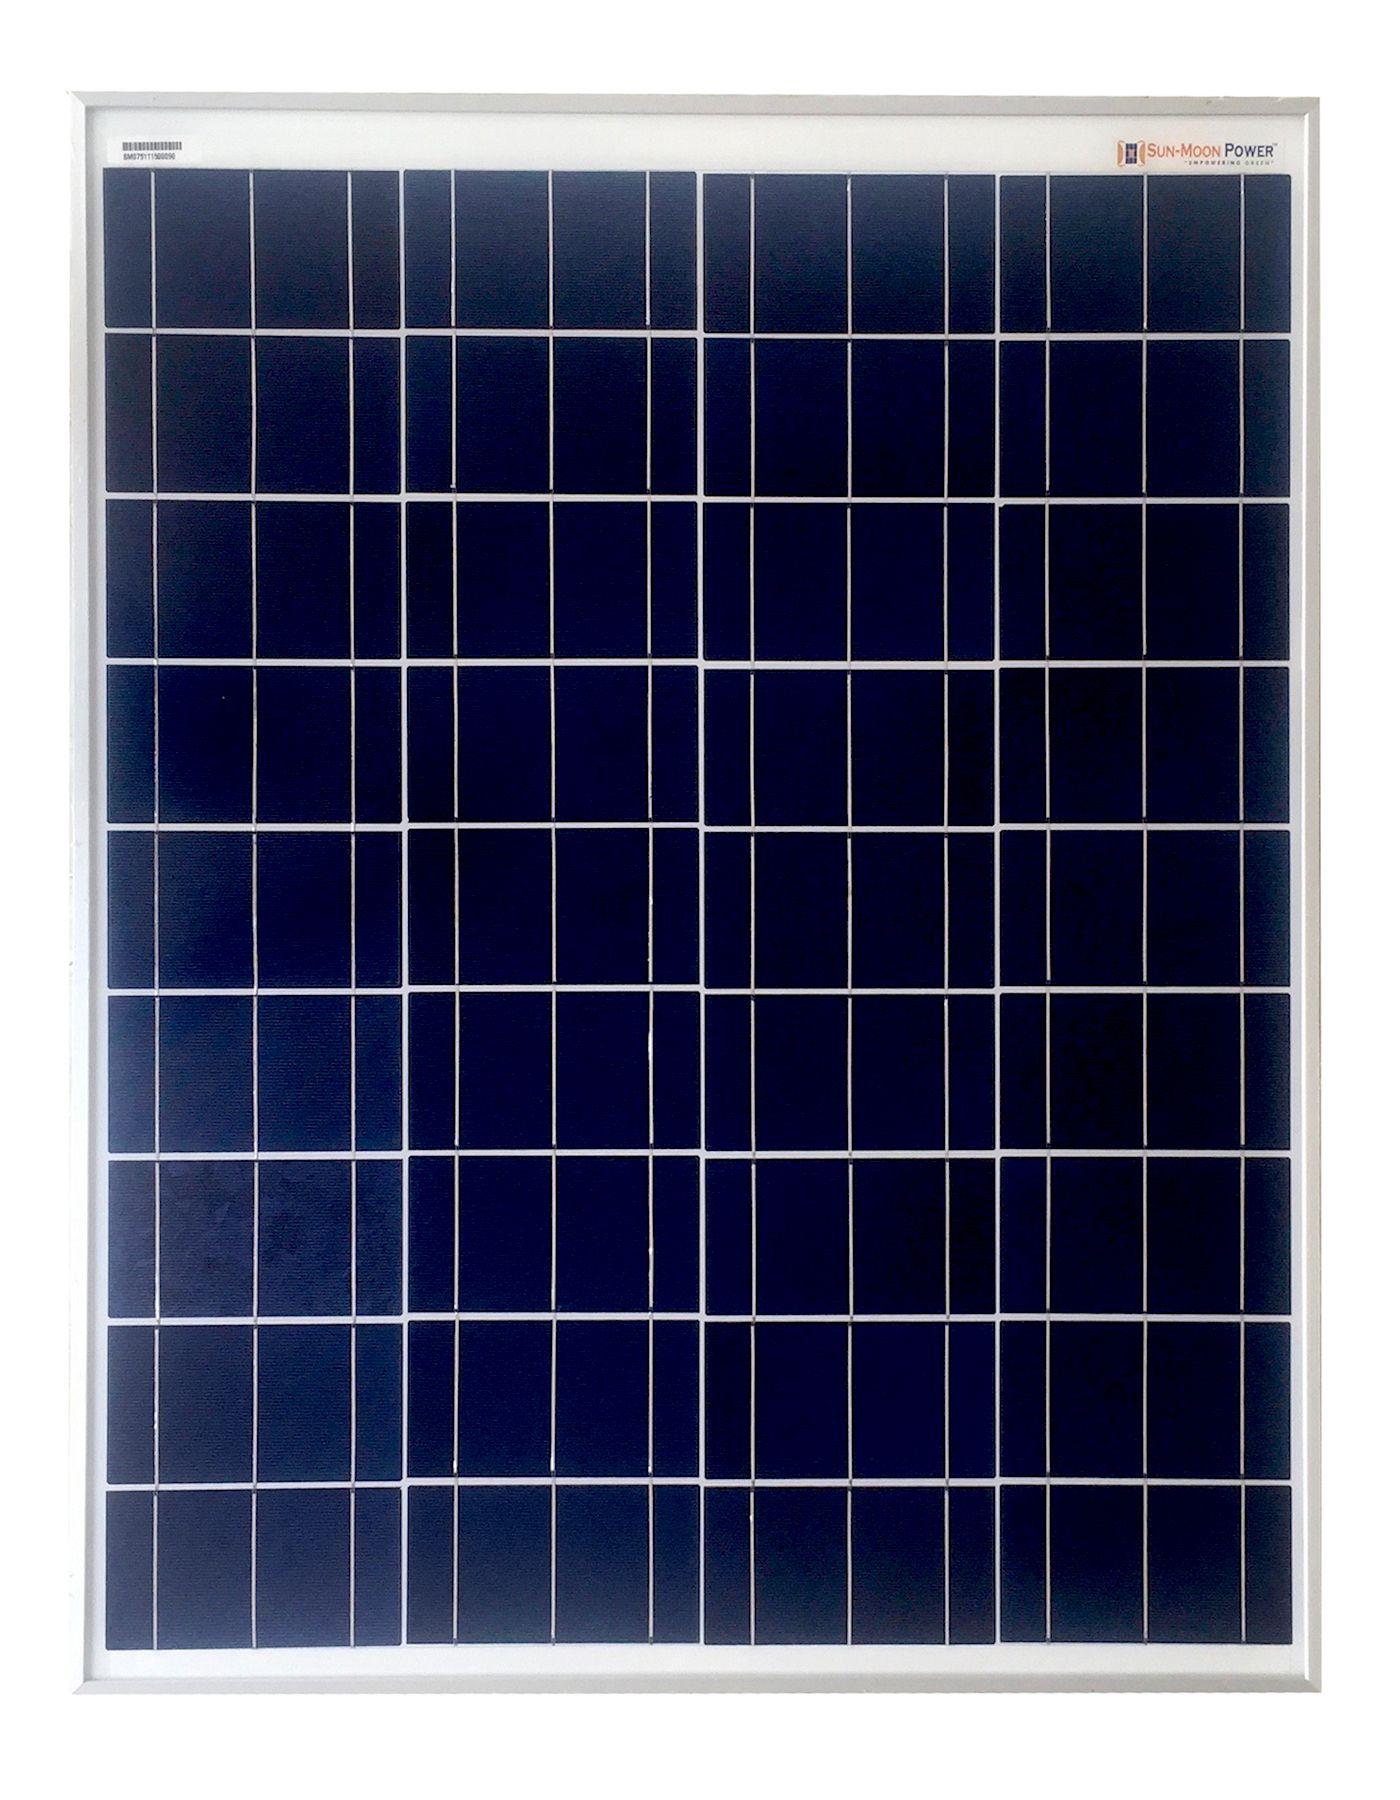 Sun Moon Power 100W 12V SDL624464648 1 4a07e Top Result 50 Inspirational Portable solar Panels Image 2018 Hdj5